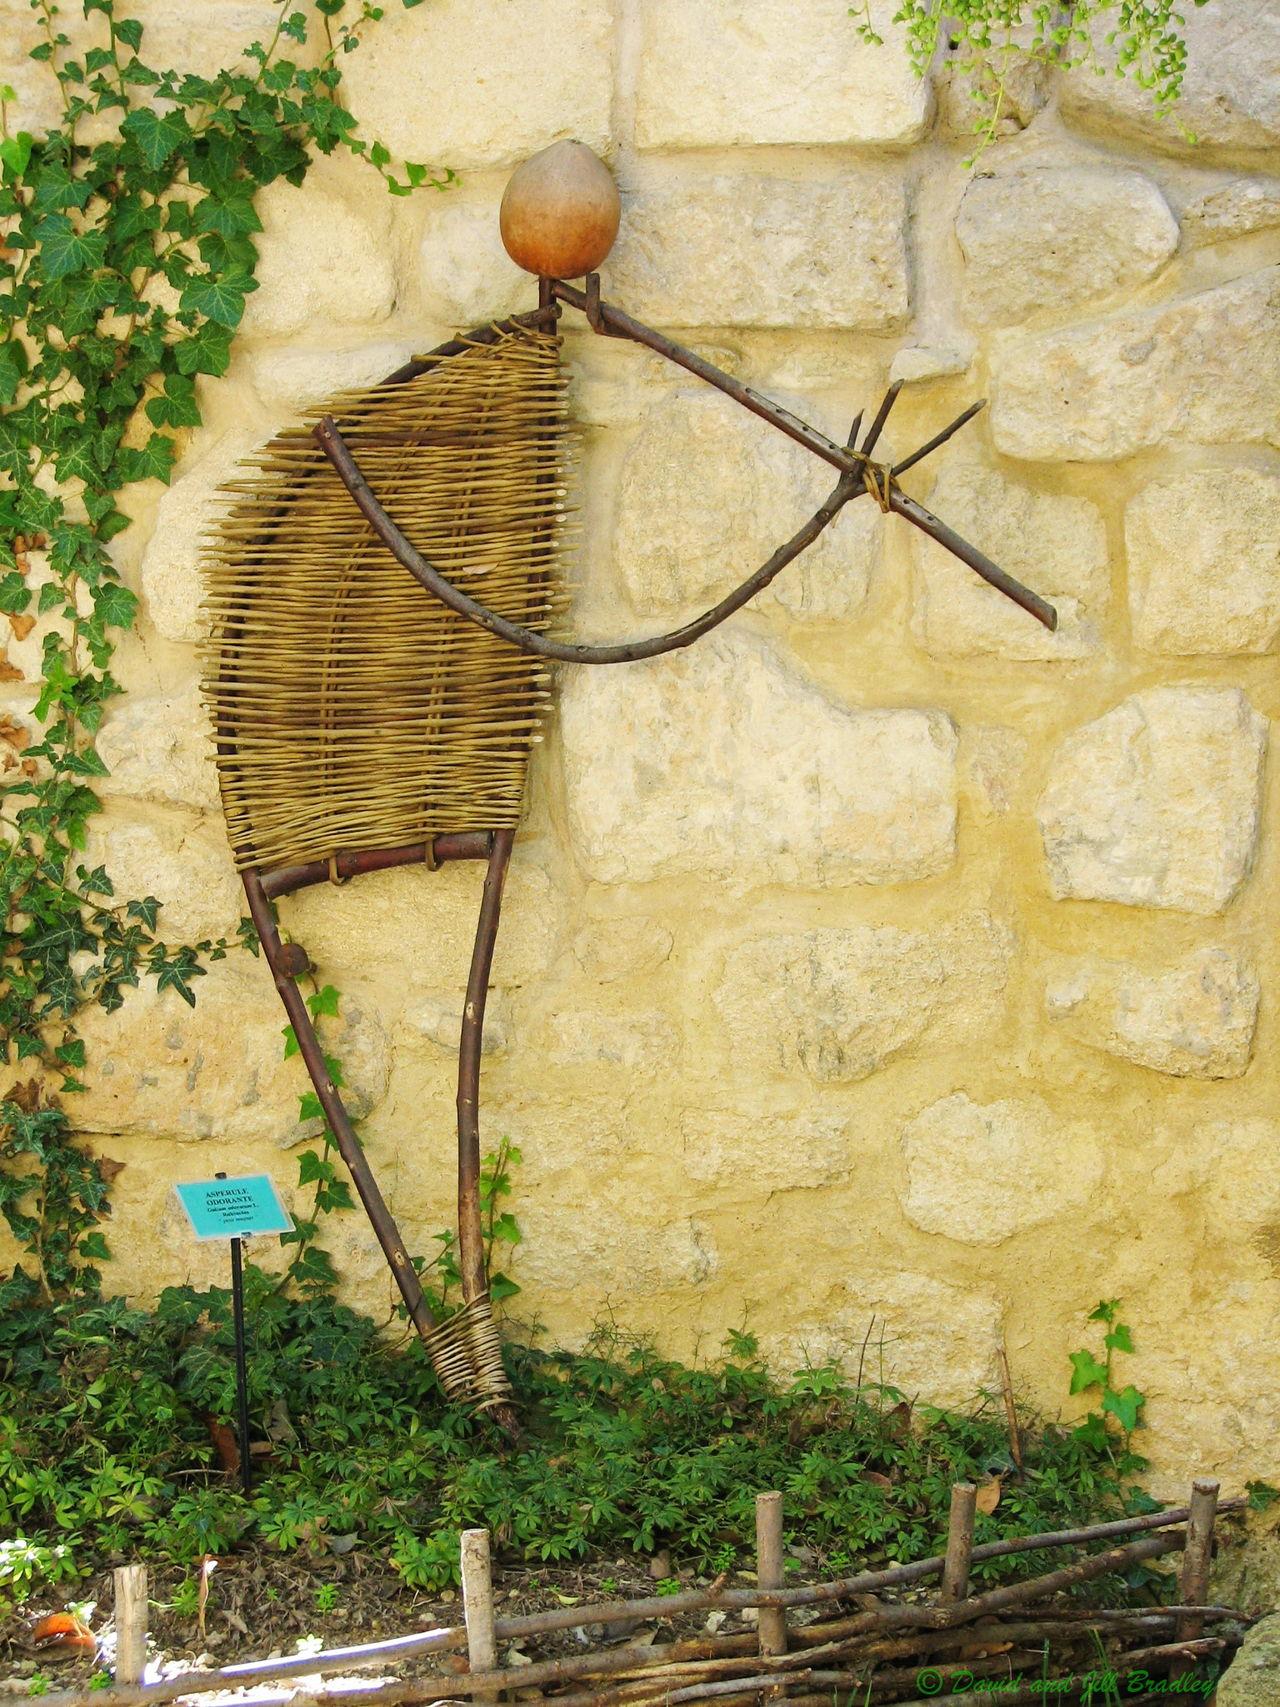 ArtWork Castle Gardens Hand-crafted Medieval Gardens Natural Materials Pipe Player Uzés